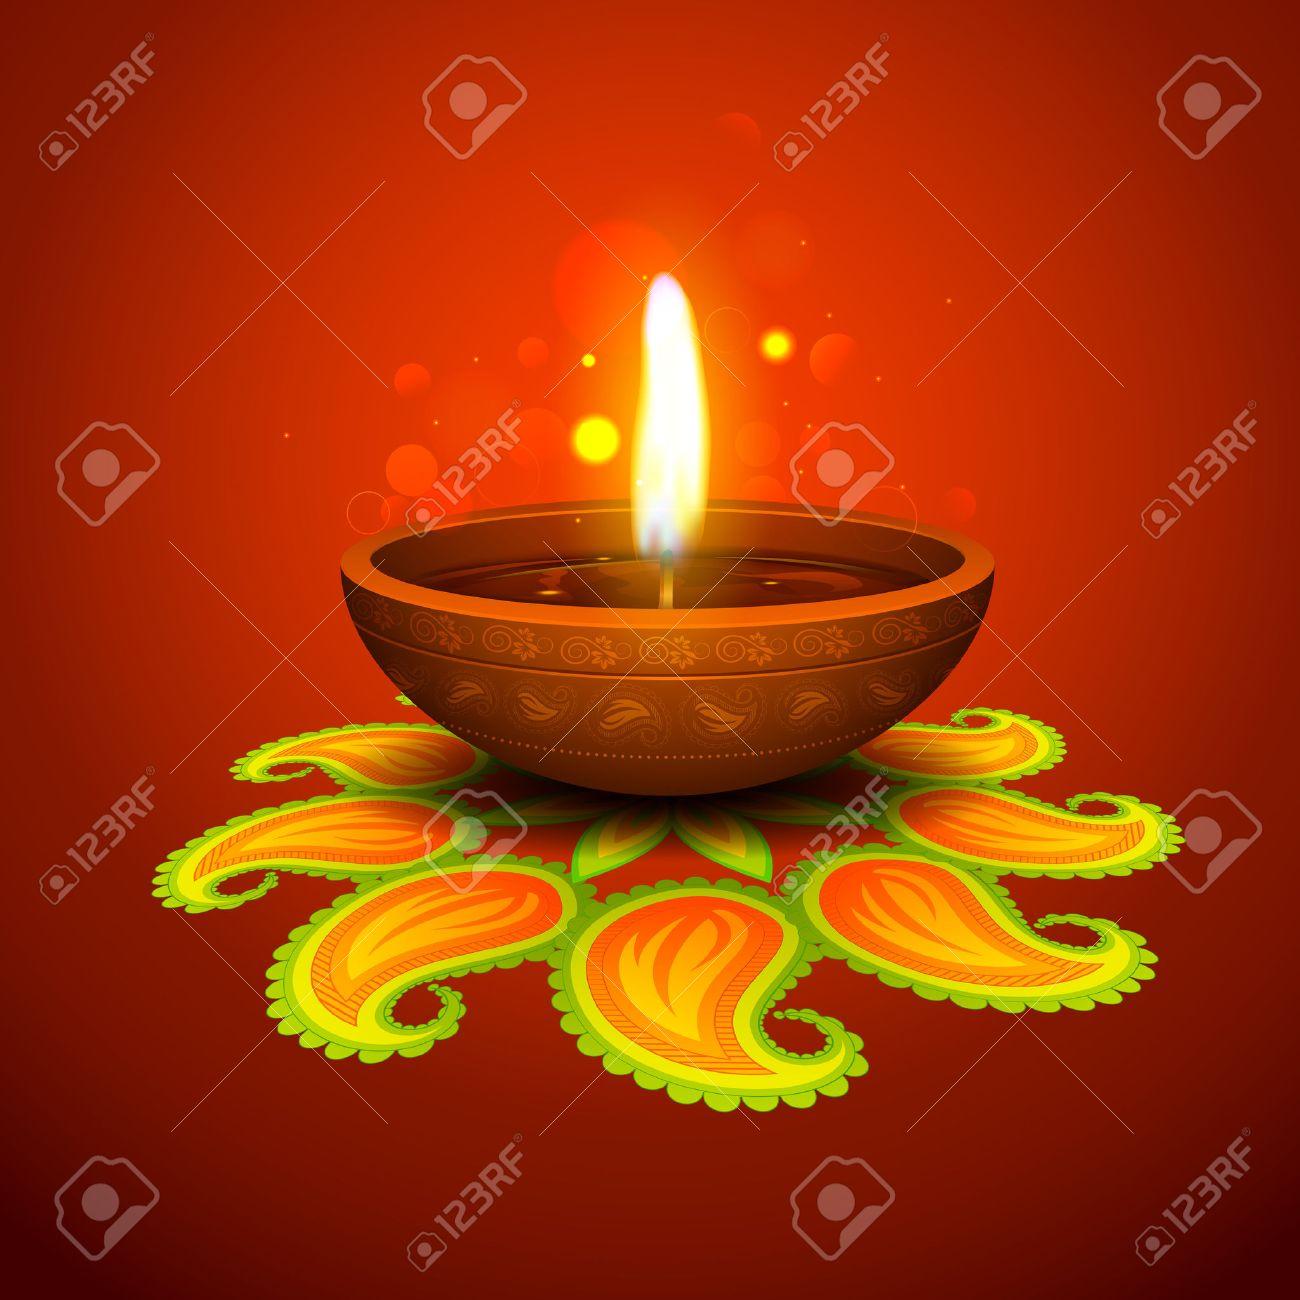 Illustration Of Burning Diya On Diwali Holiday Background Royalty ...